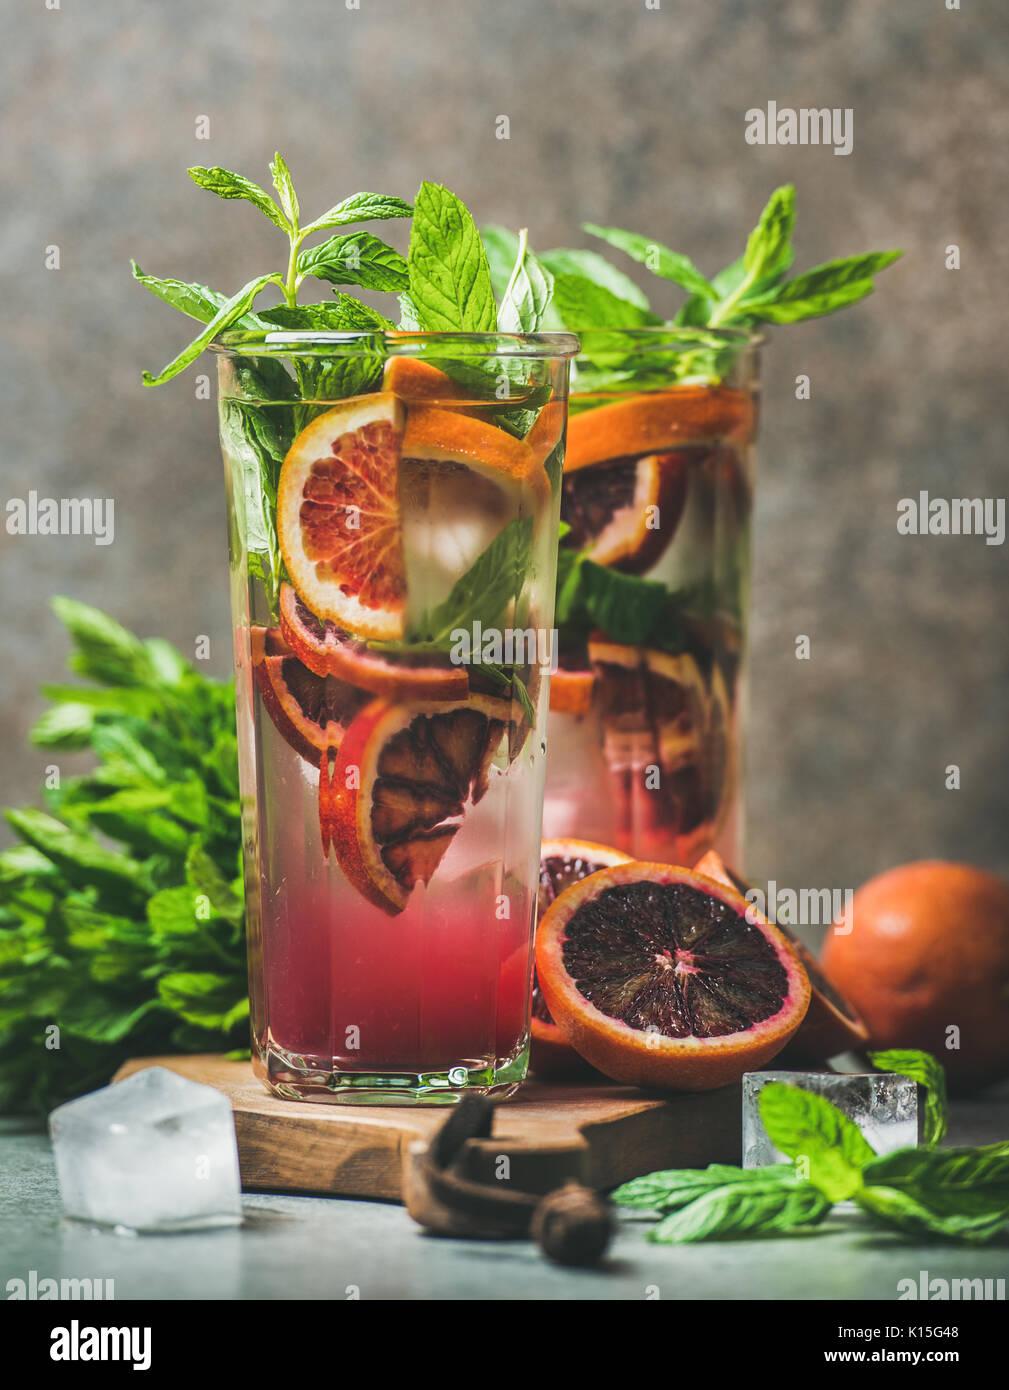 Blood orange citrus lemonade with mint and ice - Stock Image